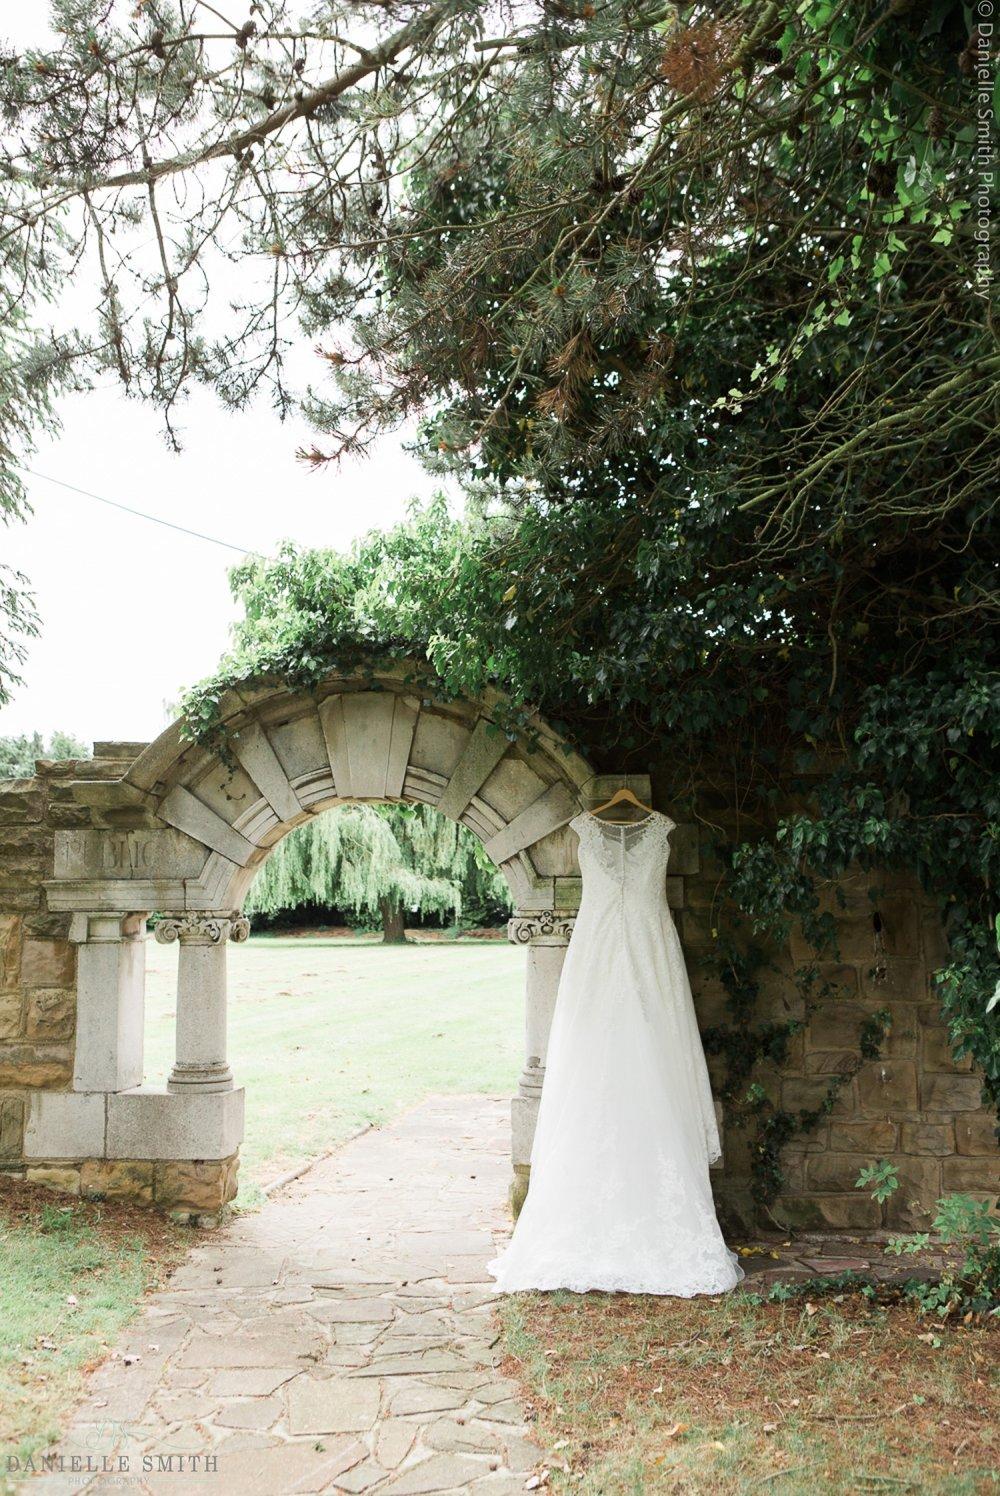 wedding dress hanging up outside